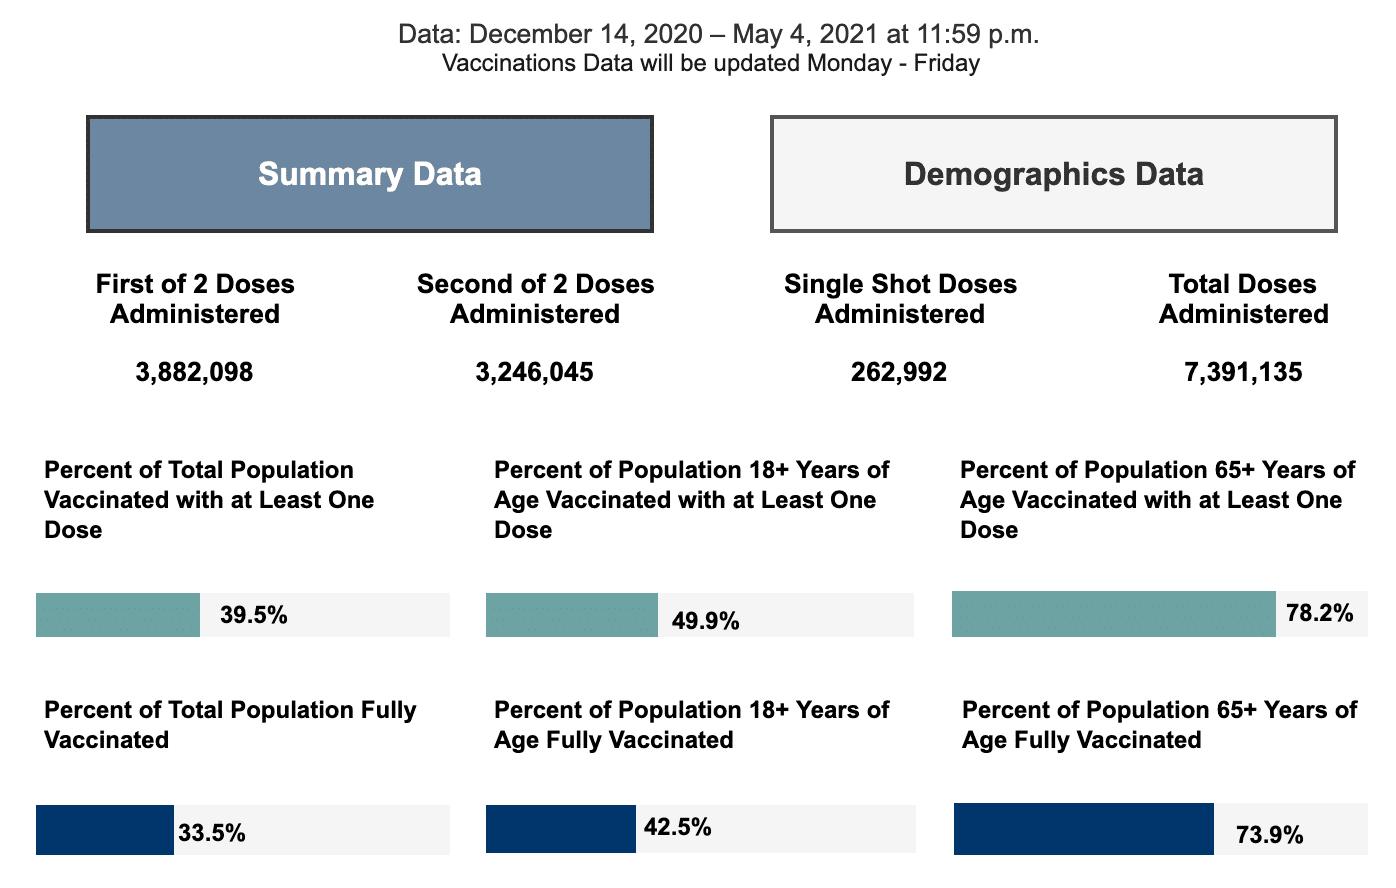 Wednesday May 5, 2021 - Appalachian State, Watauga, Alleghany, Ashe COVID-19 Cases & Vaccine Data